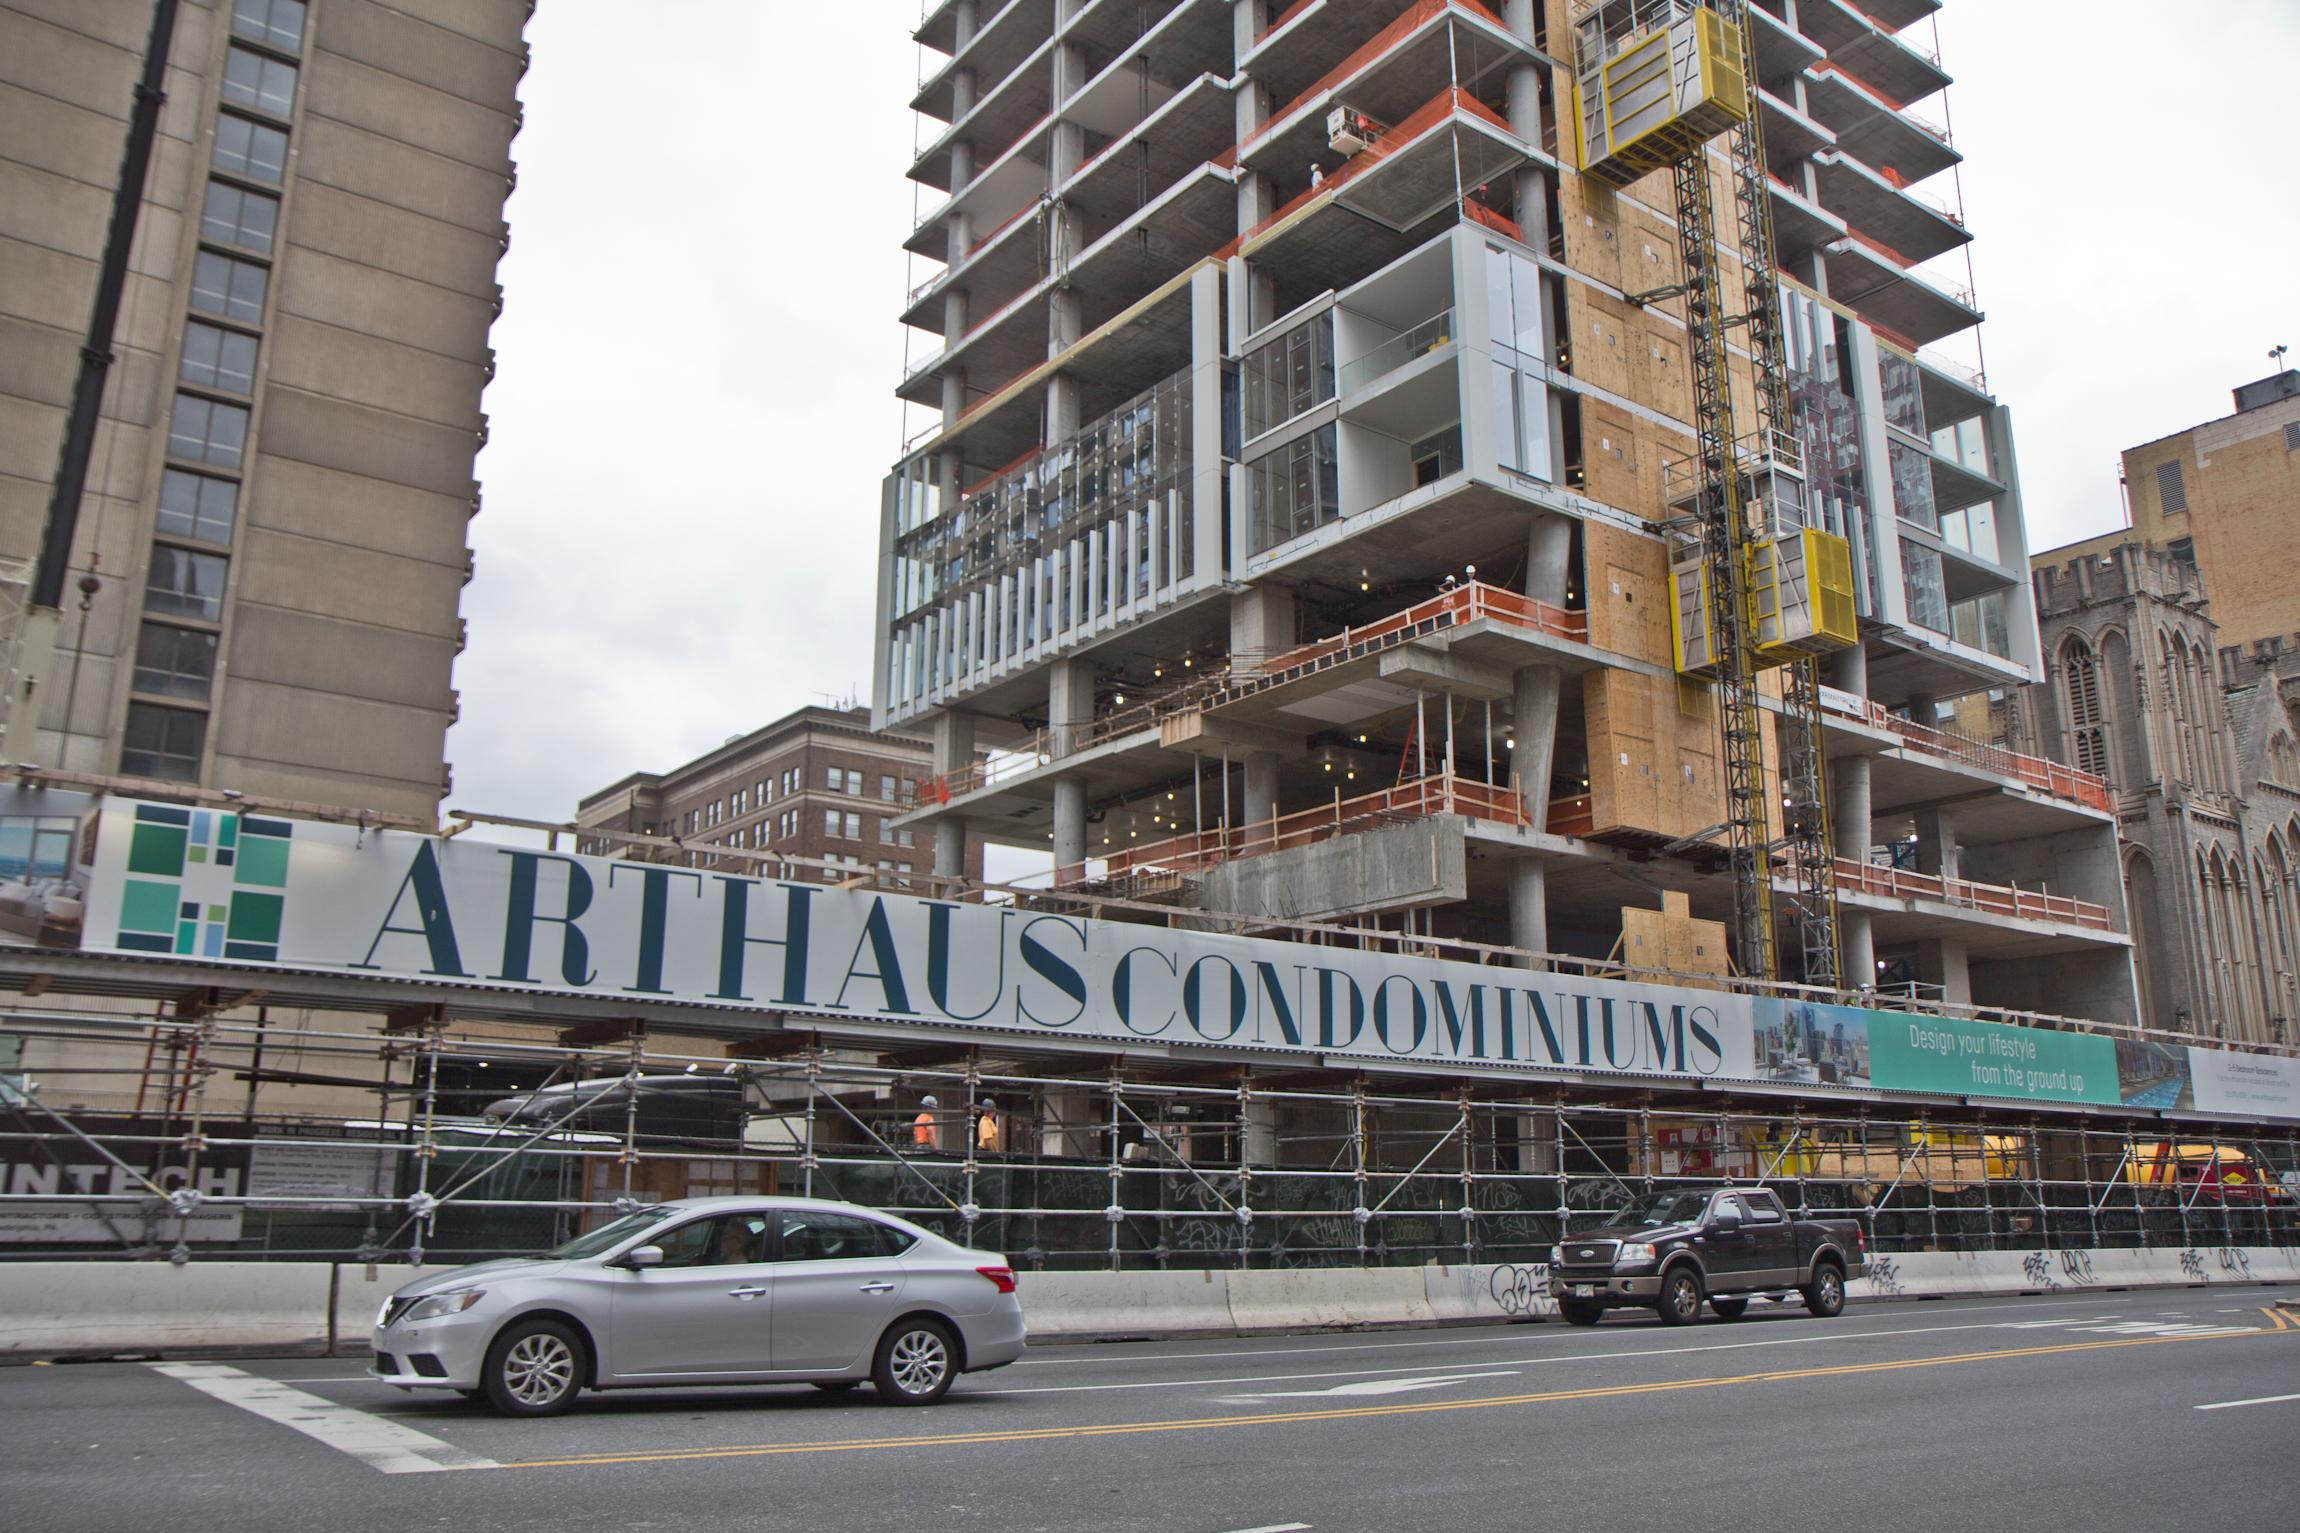 The under-construction Arthaus Condominiums